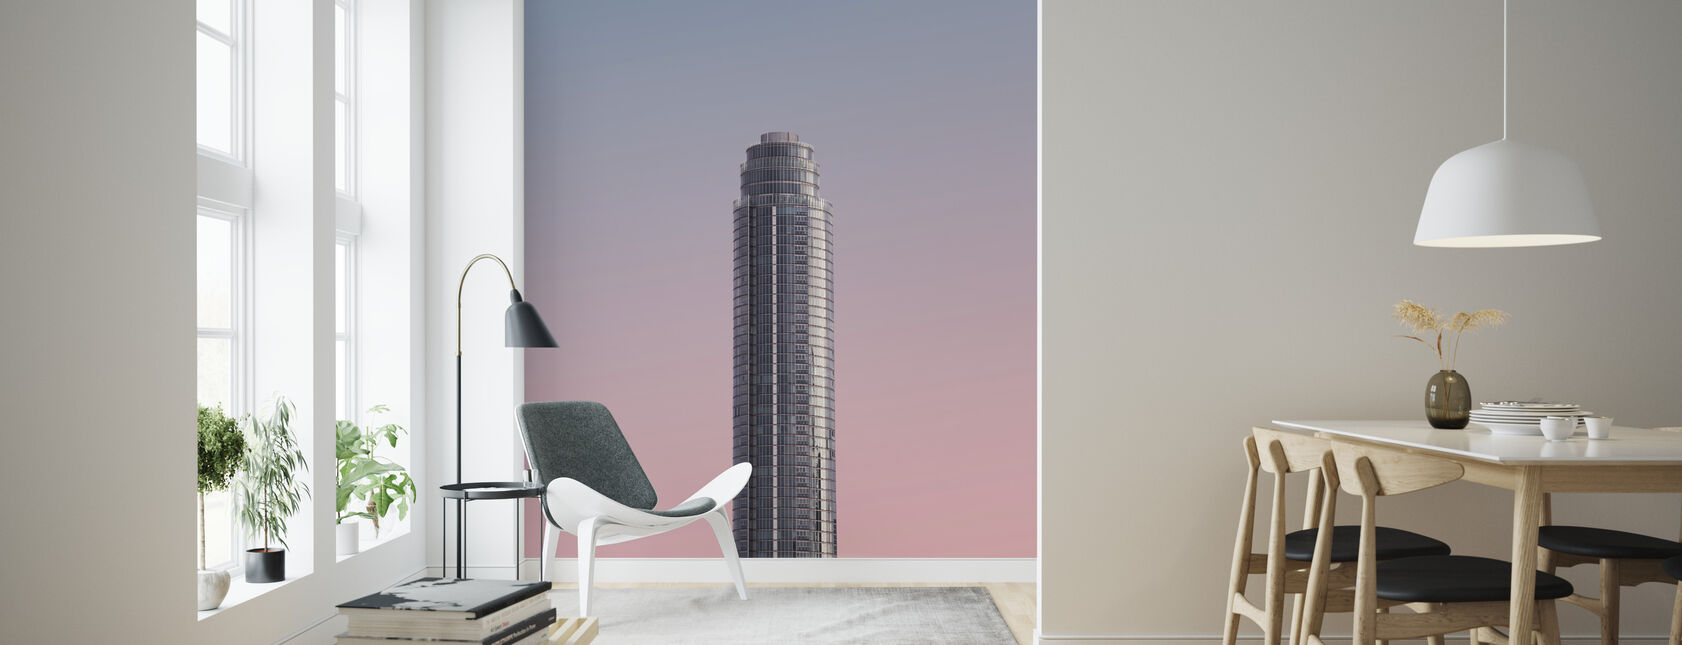 Tower - Wallpaper - Living Room